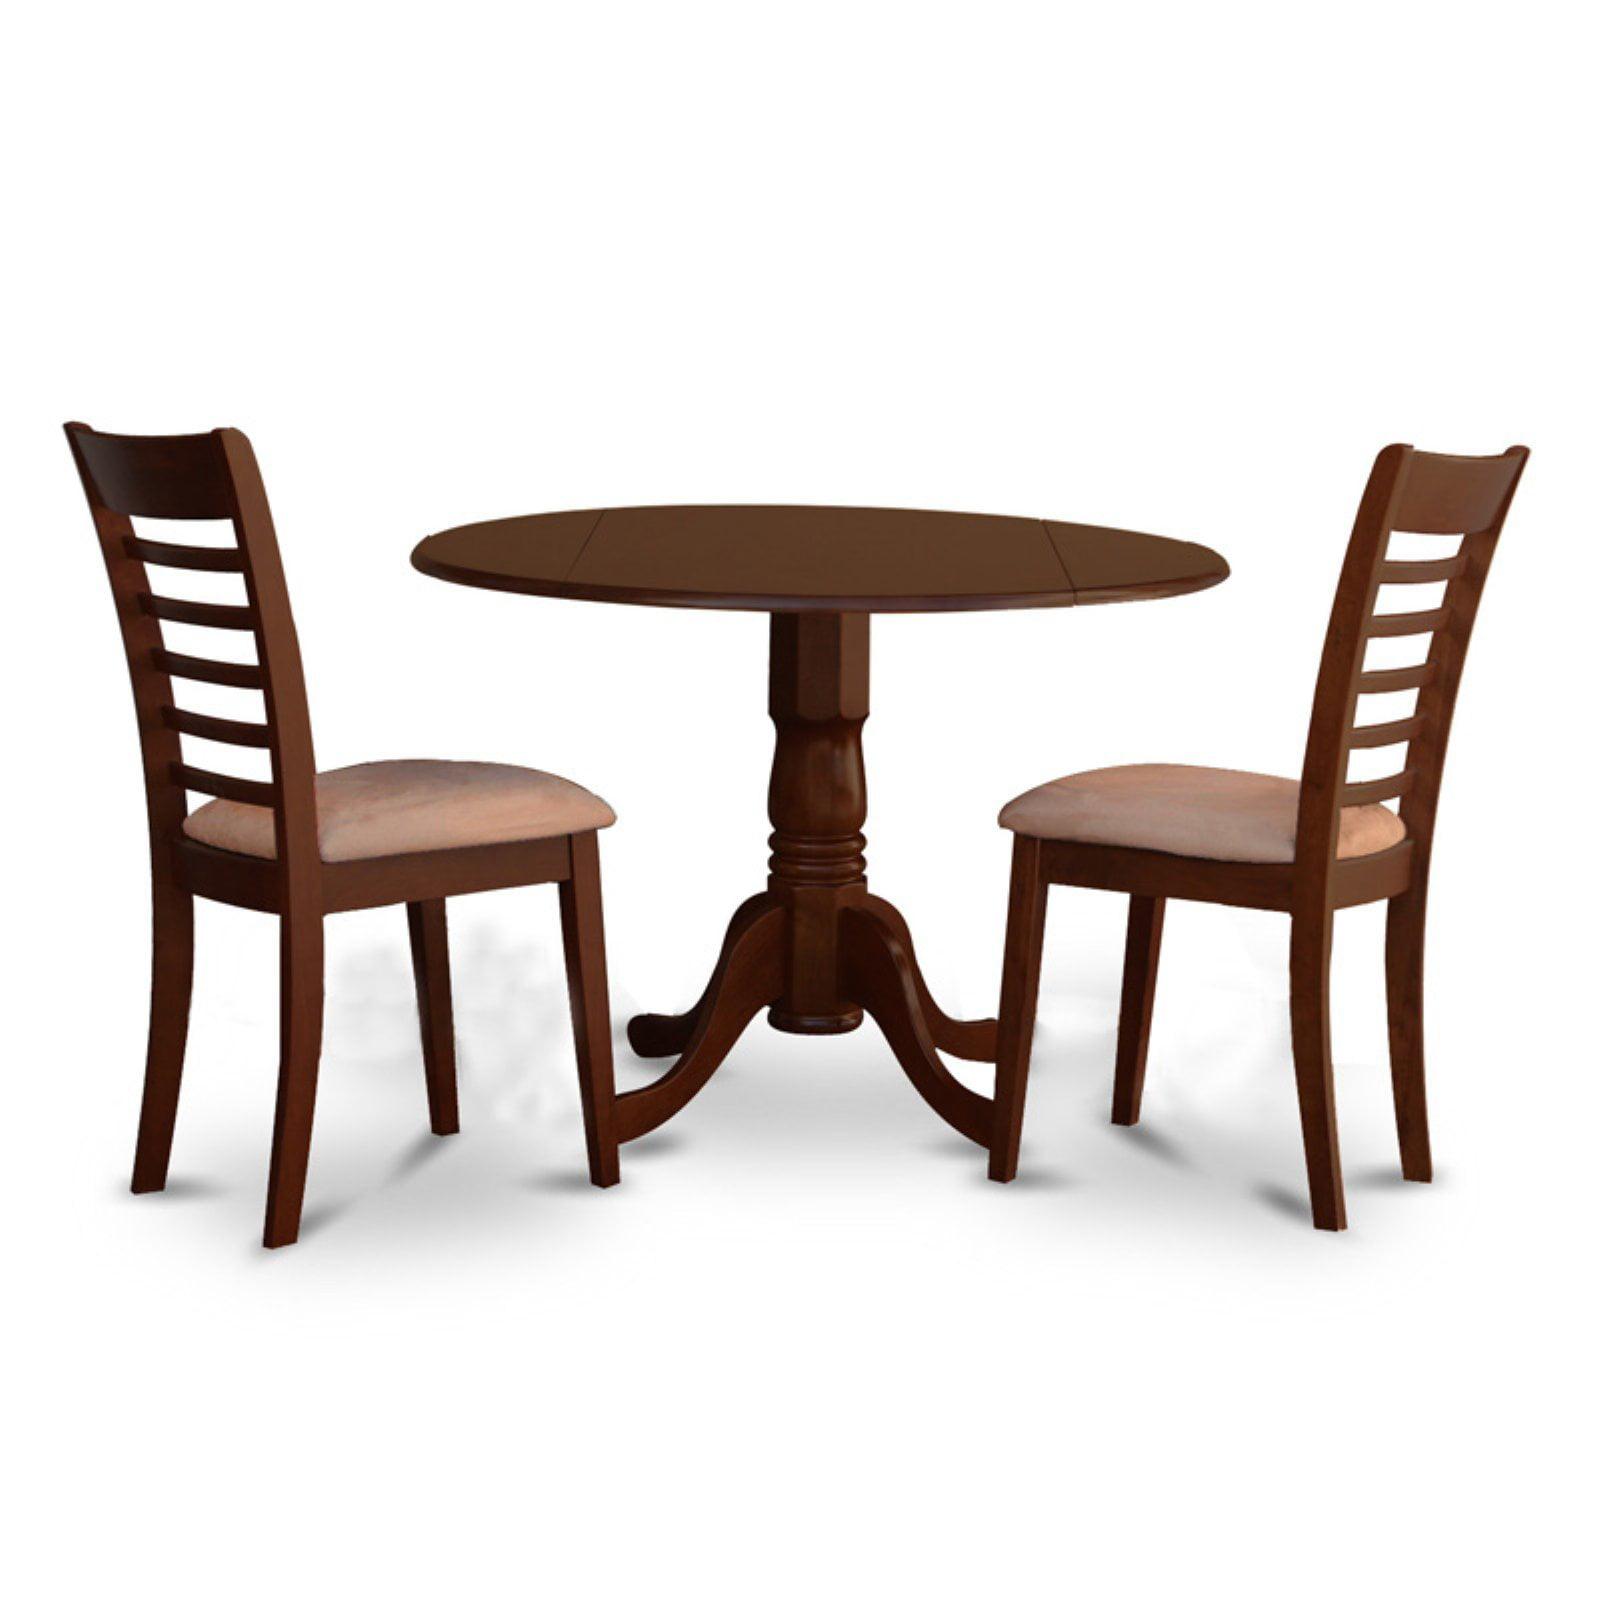 East West Furniture 3 Piece Straight Ladderback Drop Leaf Dinette Dining Table Set